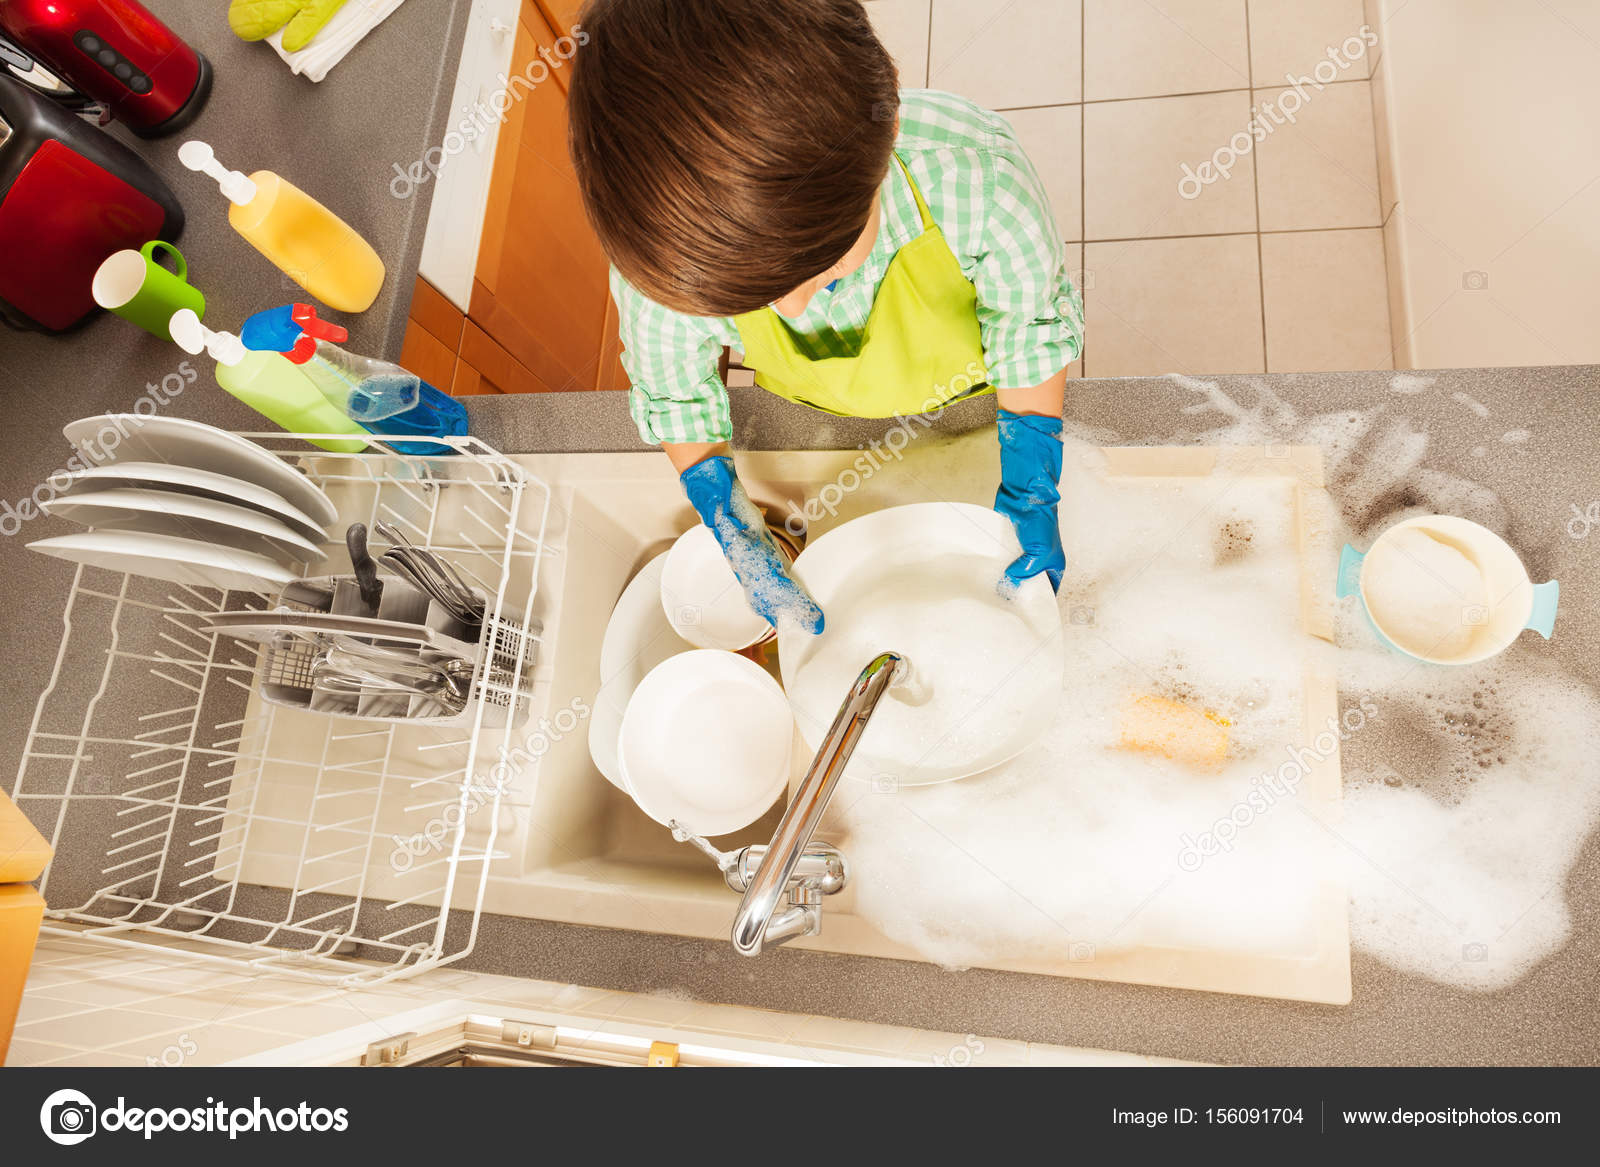 картинки мальчик моет посуду